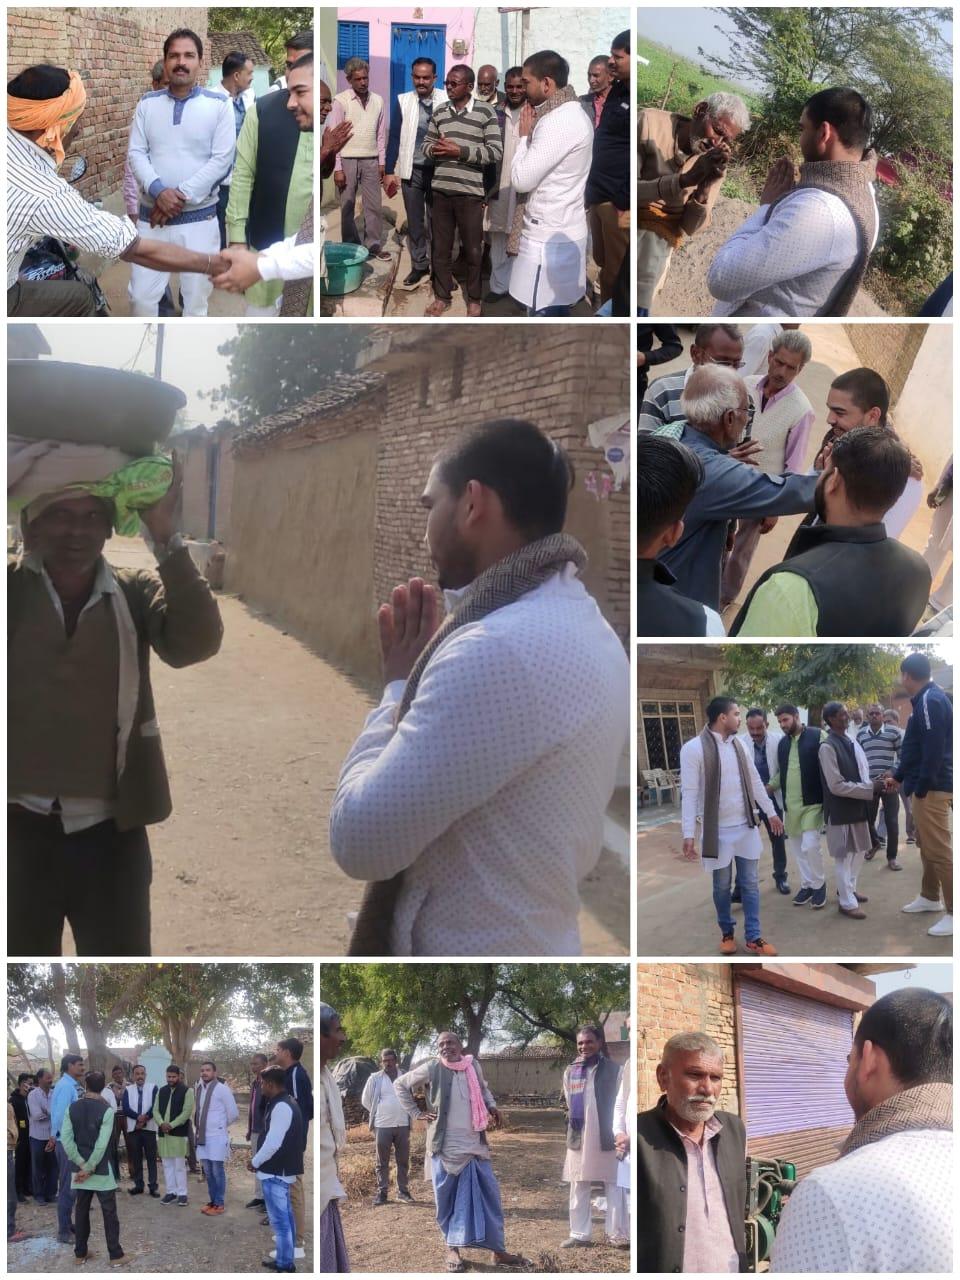 जालौन-गाँव गाँव -पाँव पाँव चलकर रामेन्द्र त्रिपाठी ने बताए अपने नेता के काम।